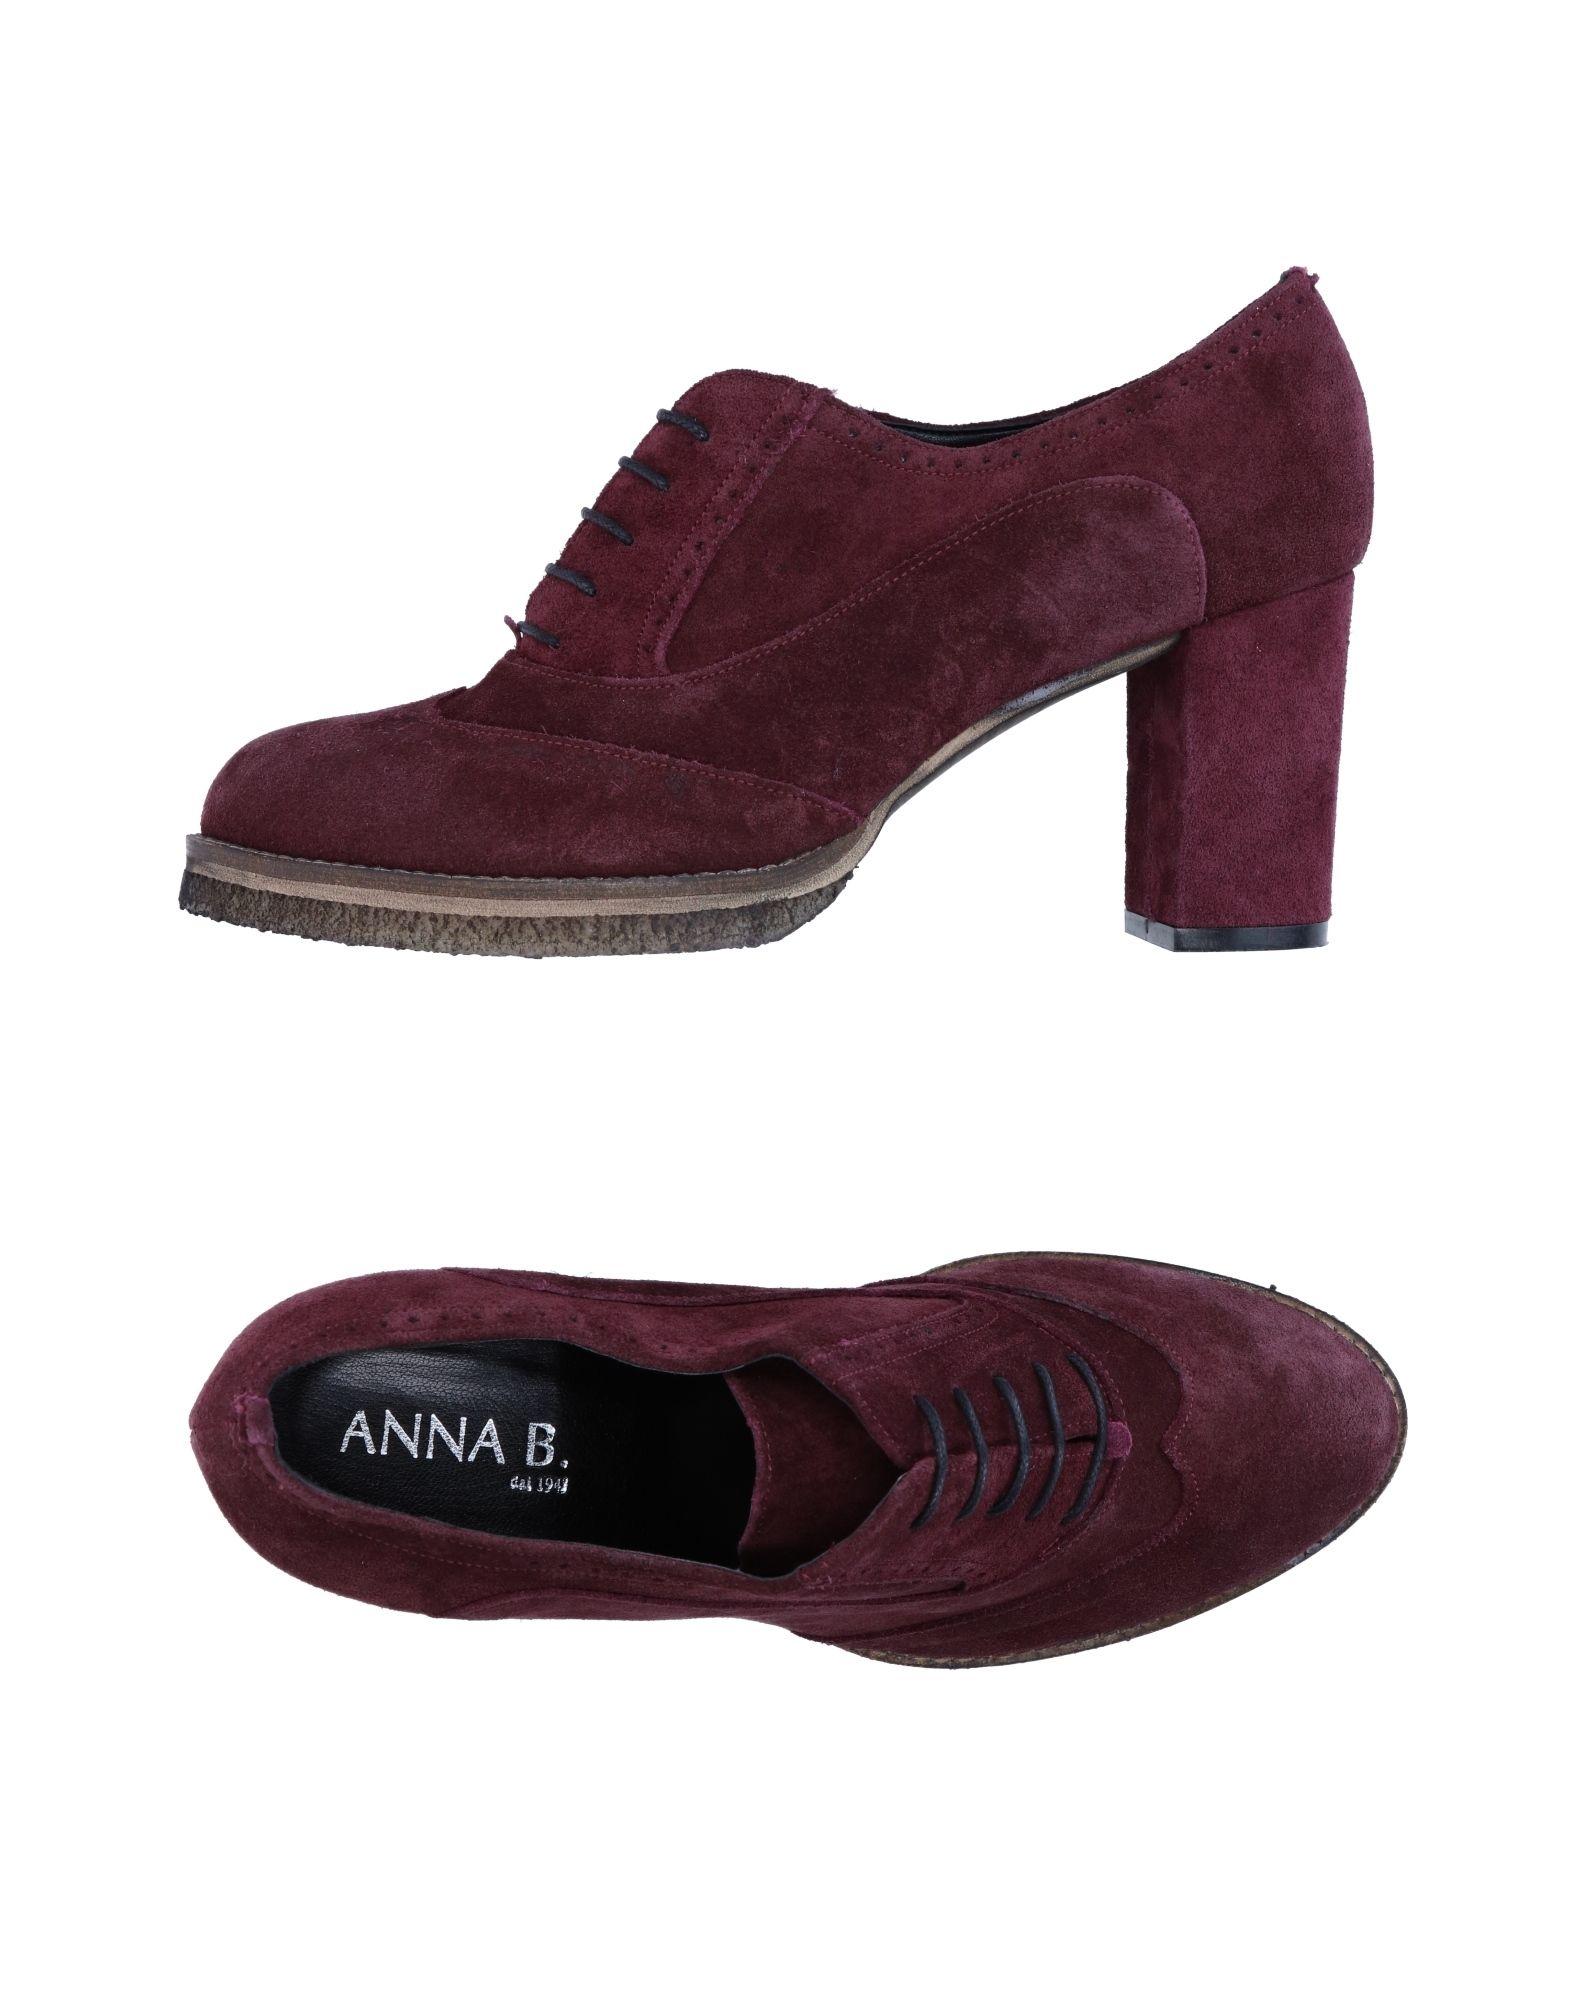 FOOTWEAR - Lace-up shoes Anna B. Dal 1943 F465zdZ